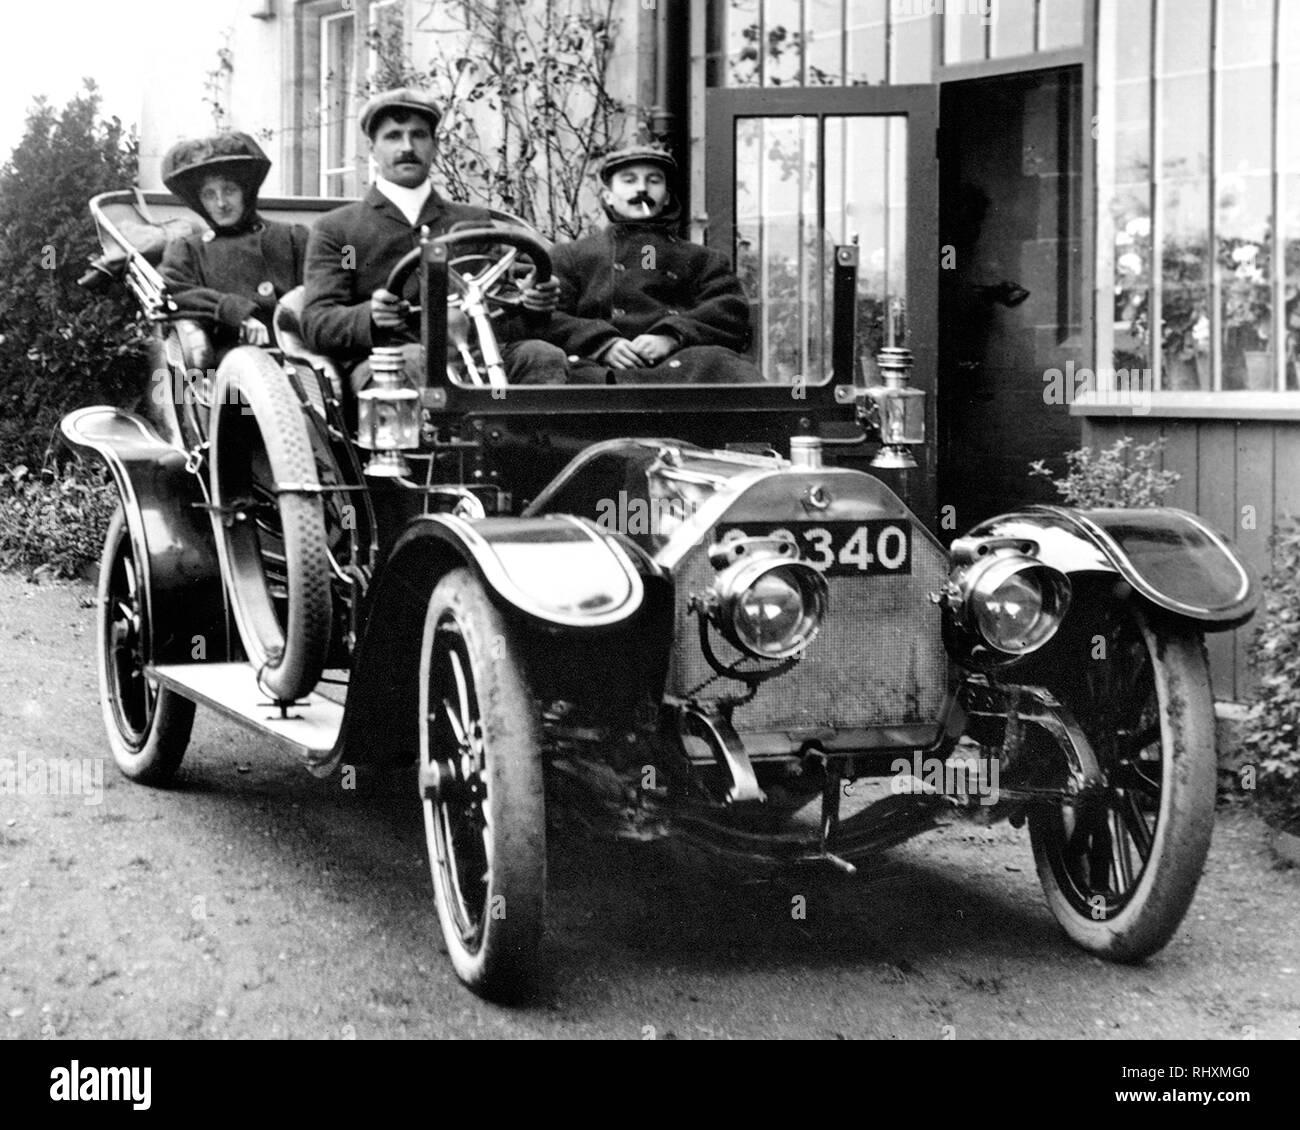 Early motor car - Stock Image